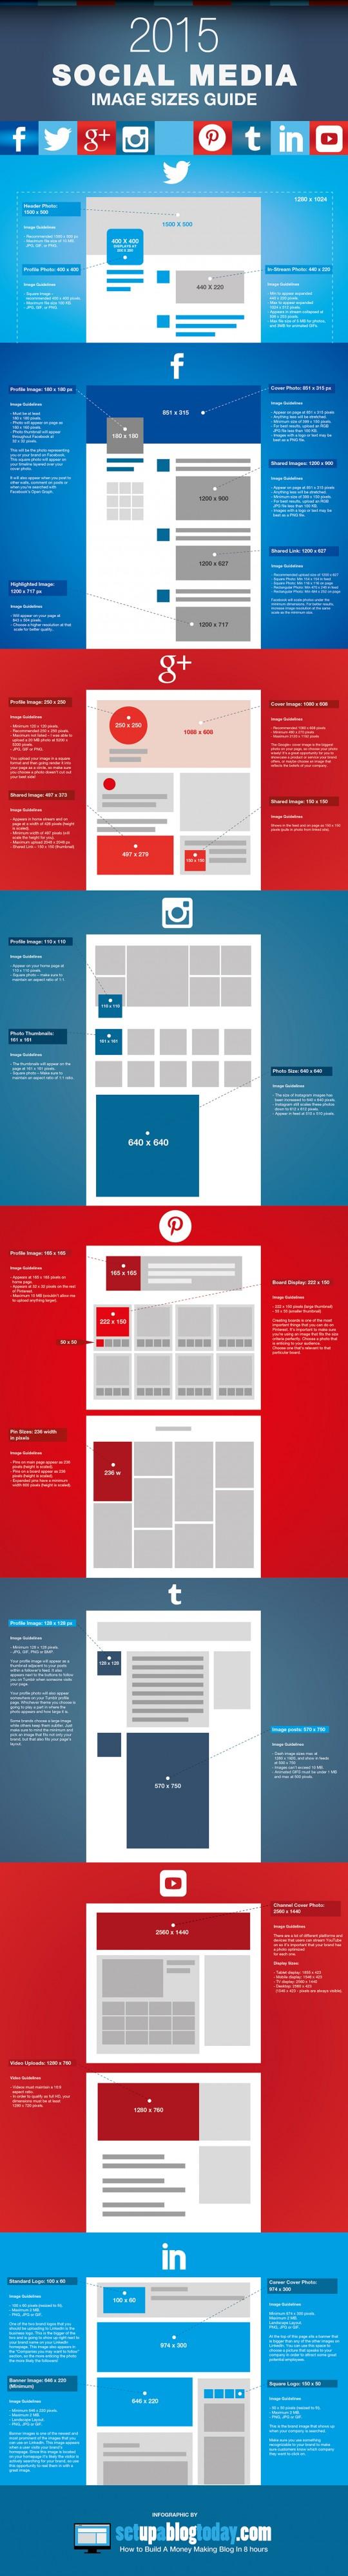 Social Media Image Size Cheat Sheet 2015